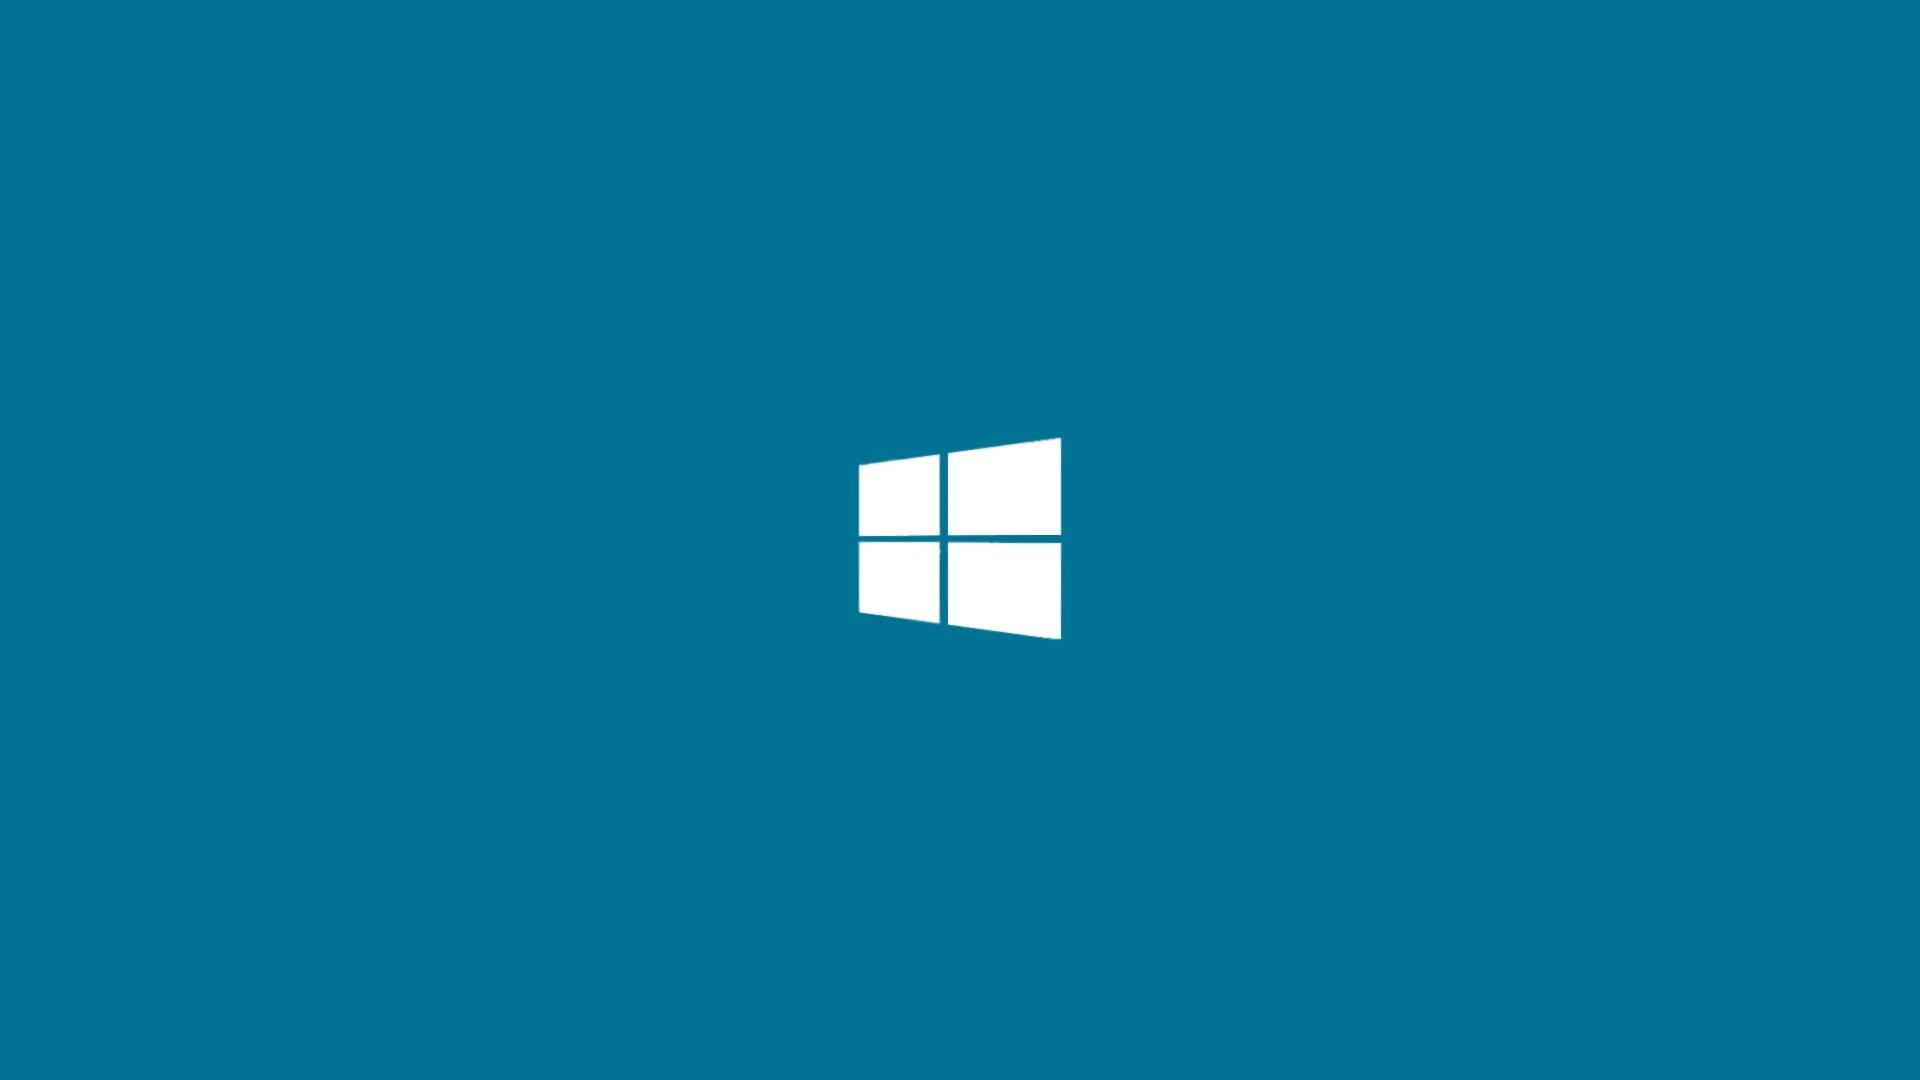 windows logo wallpapers - wallpaper cave